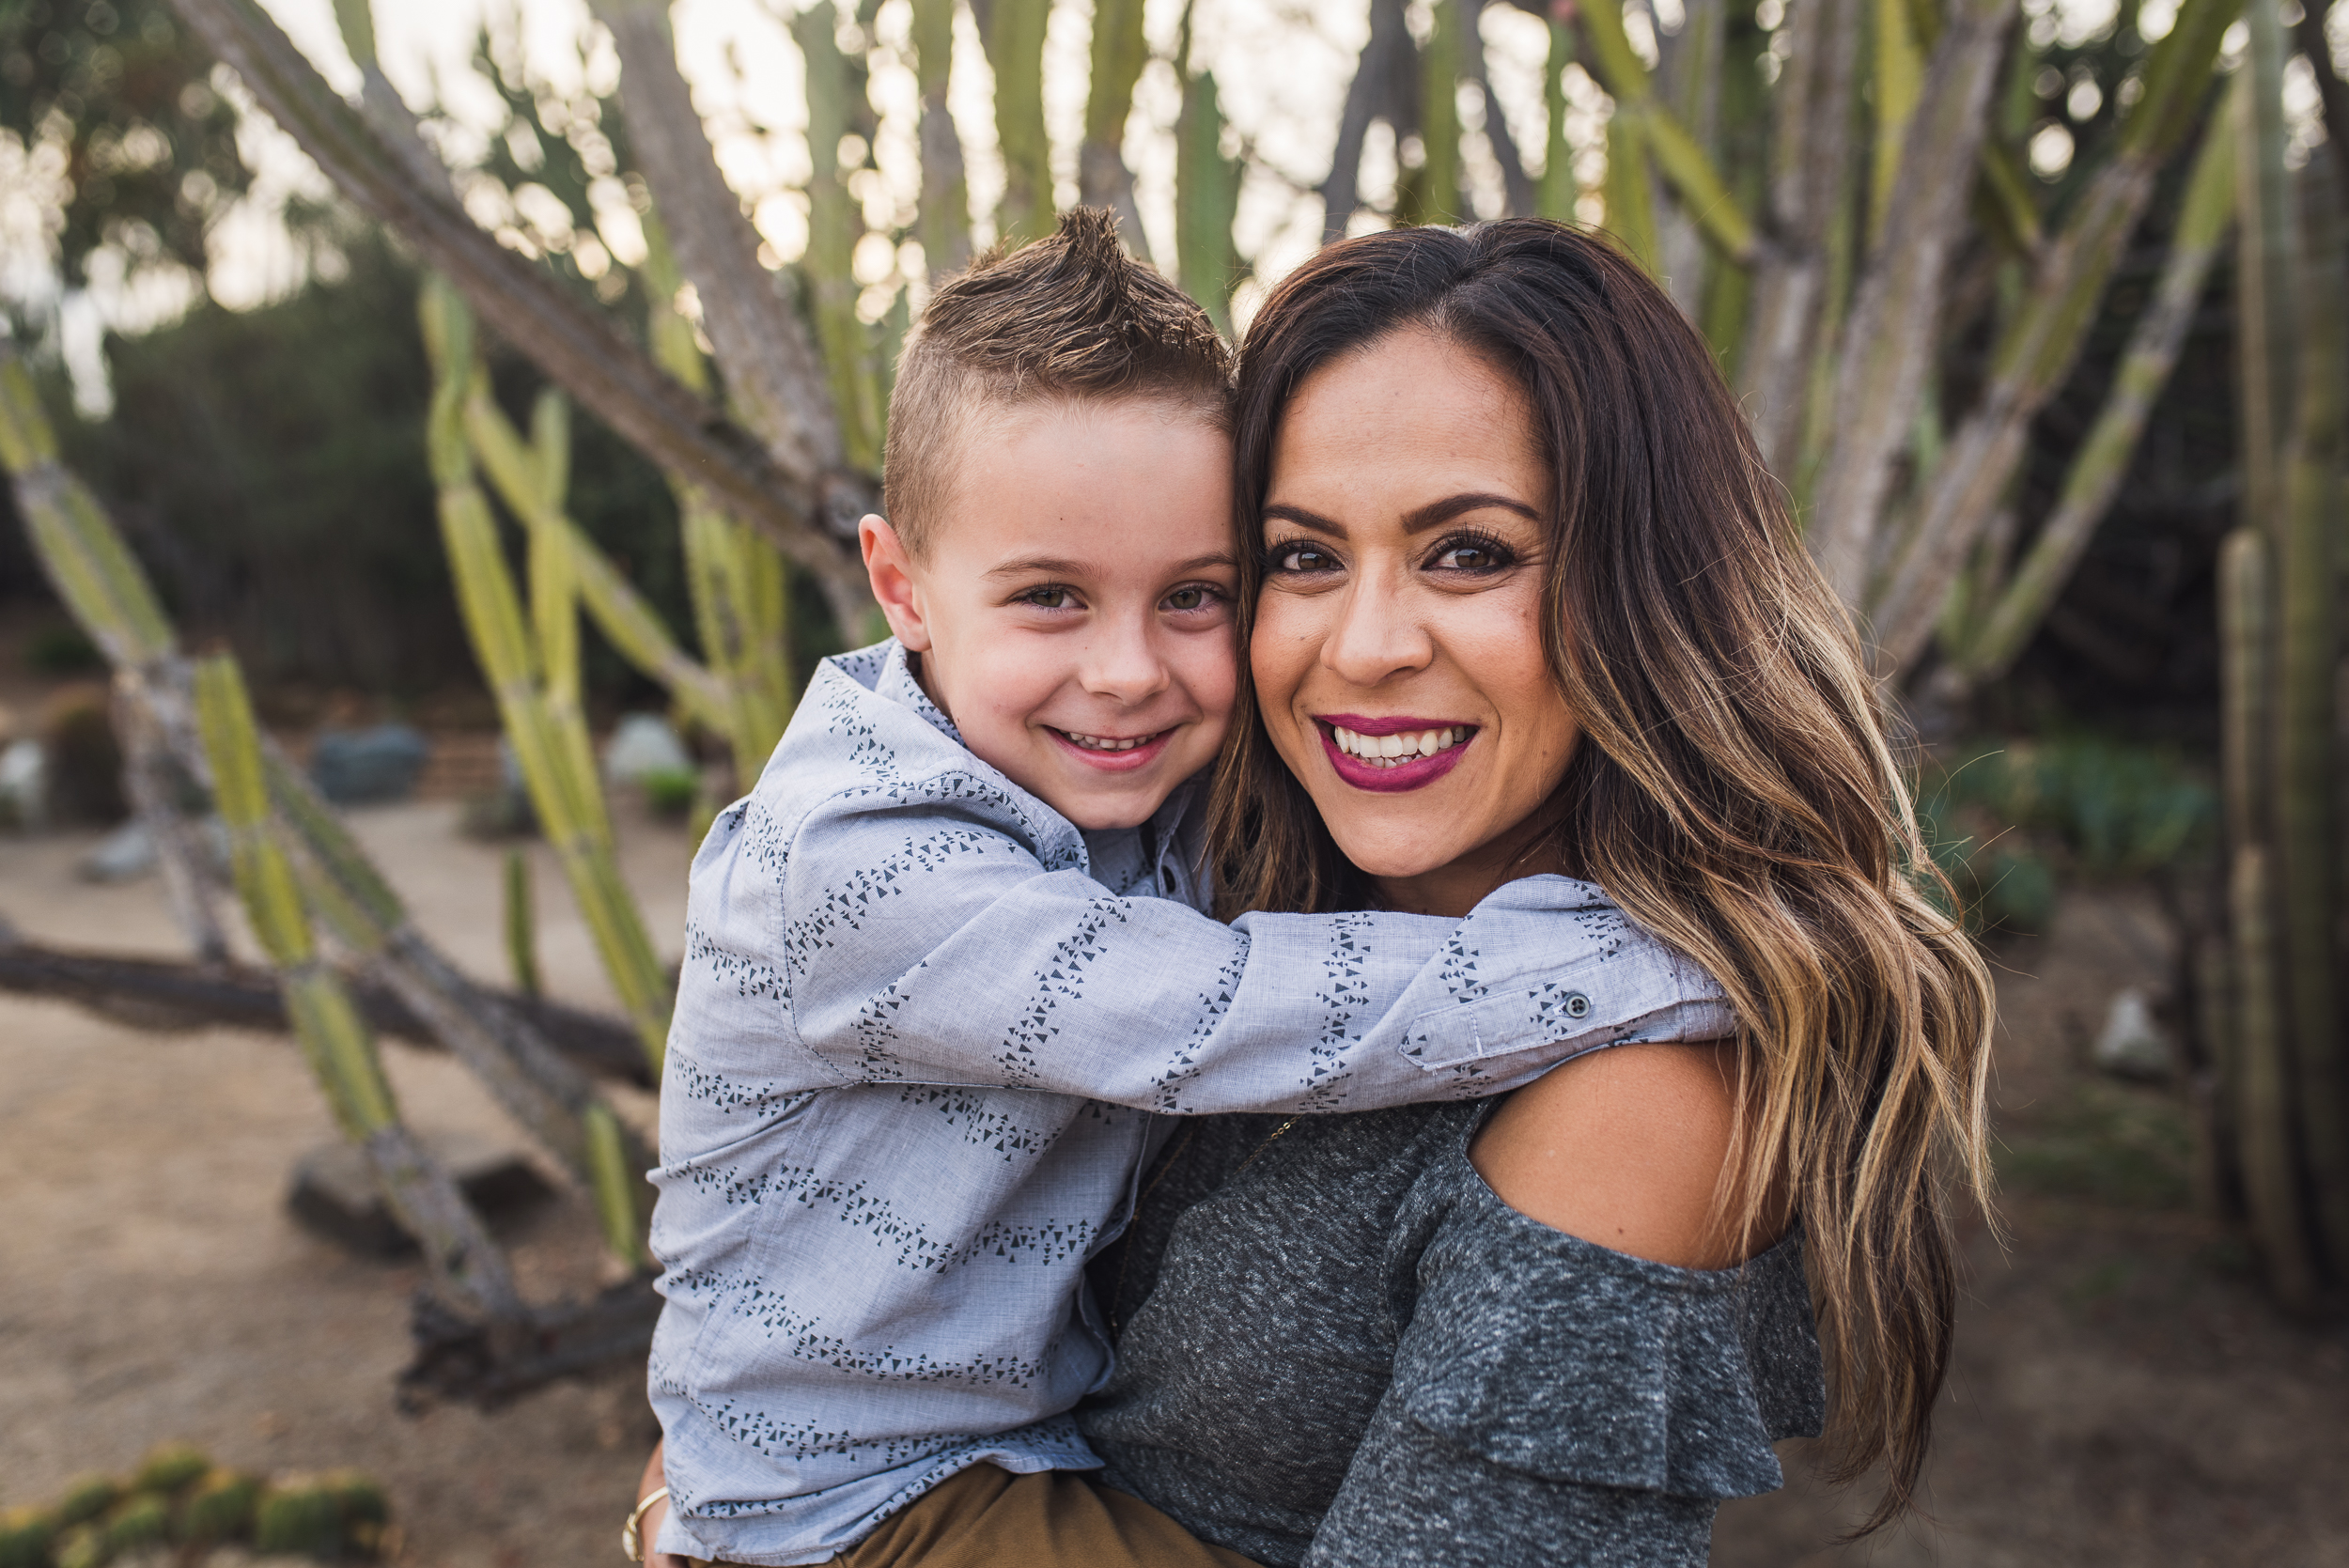 2018-San-Diego-Family-Lifestyle-Newborn-Travel-Vacation-Photographer-Kelsey-Smith-Photography-Coronado-La-Jolla-Encinitas-Solana-Beach-Del-Mar-105.jpg